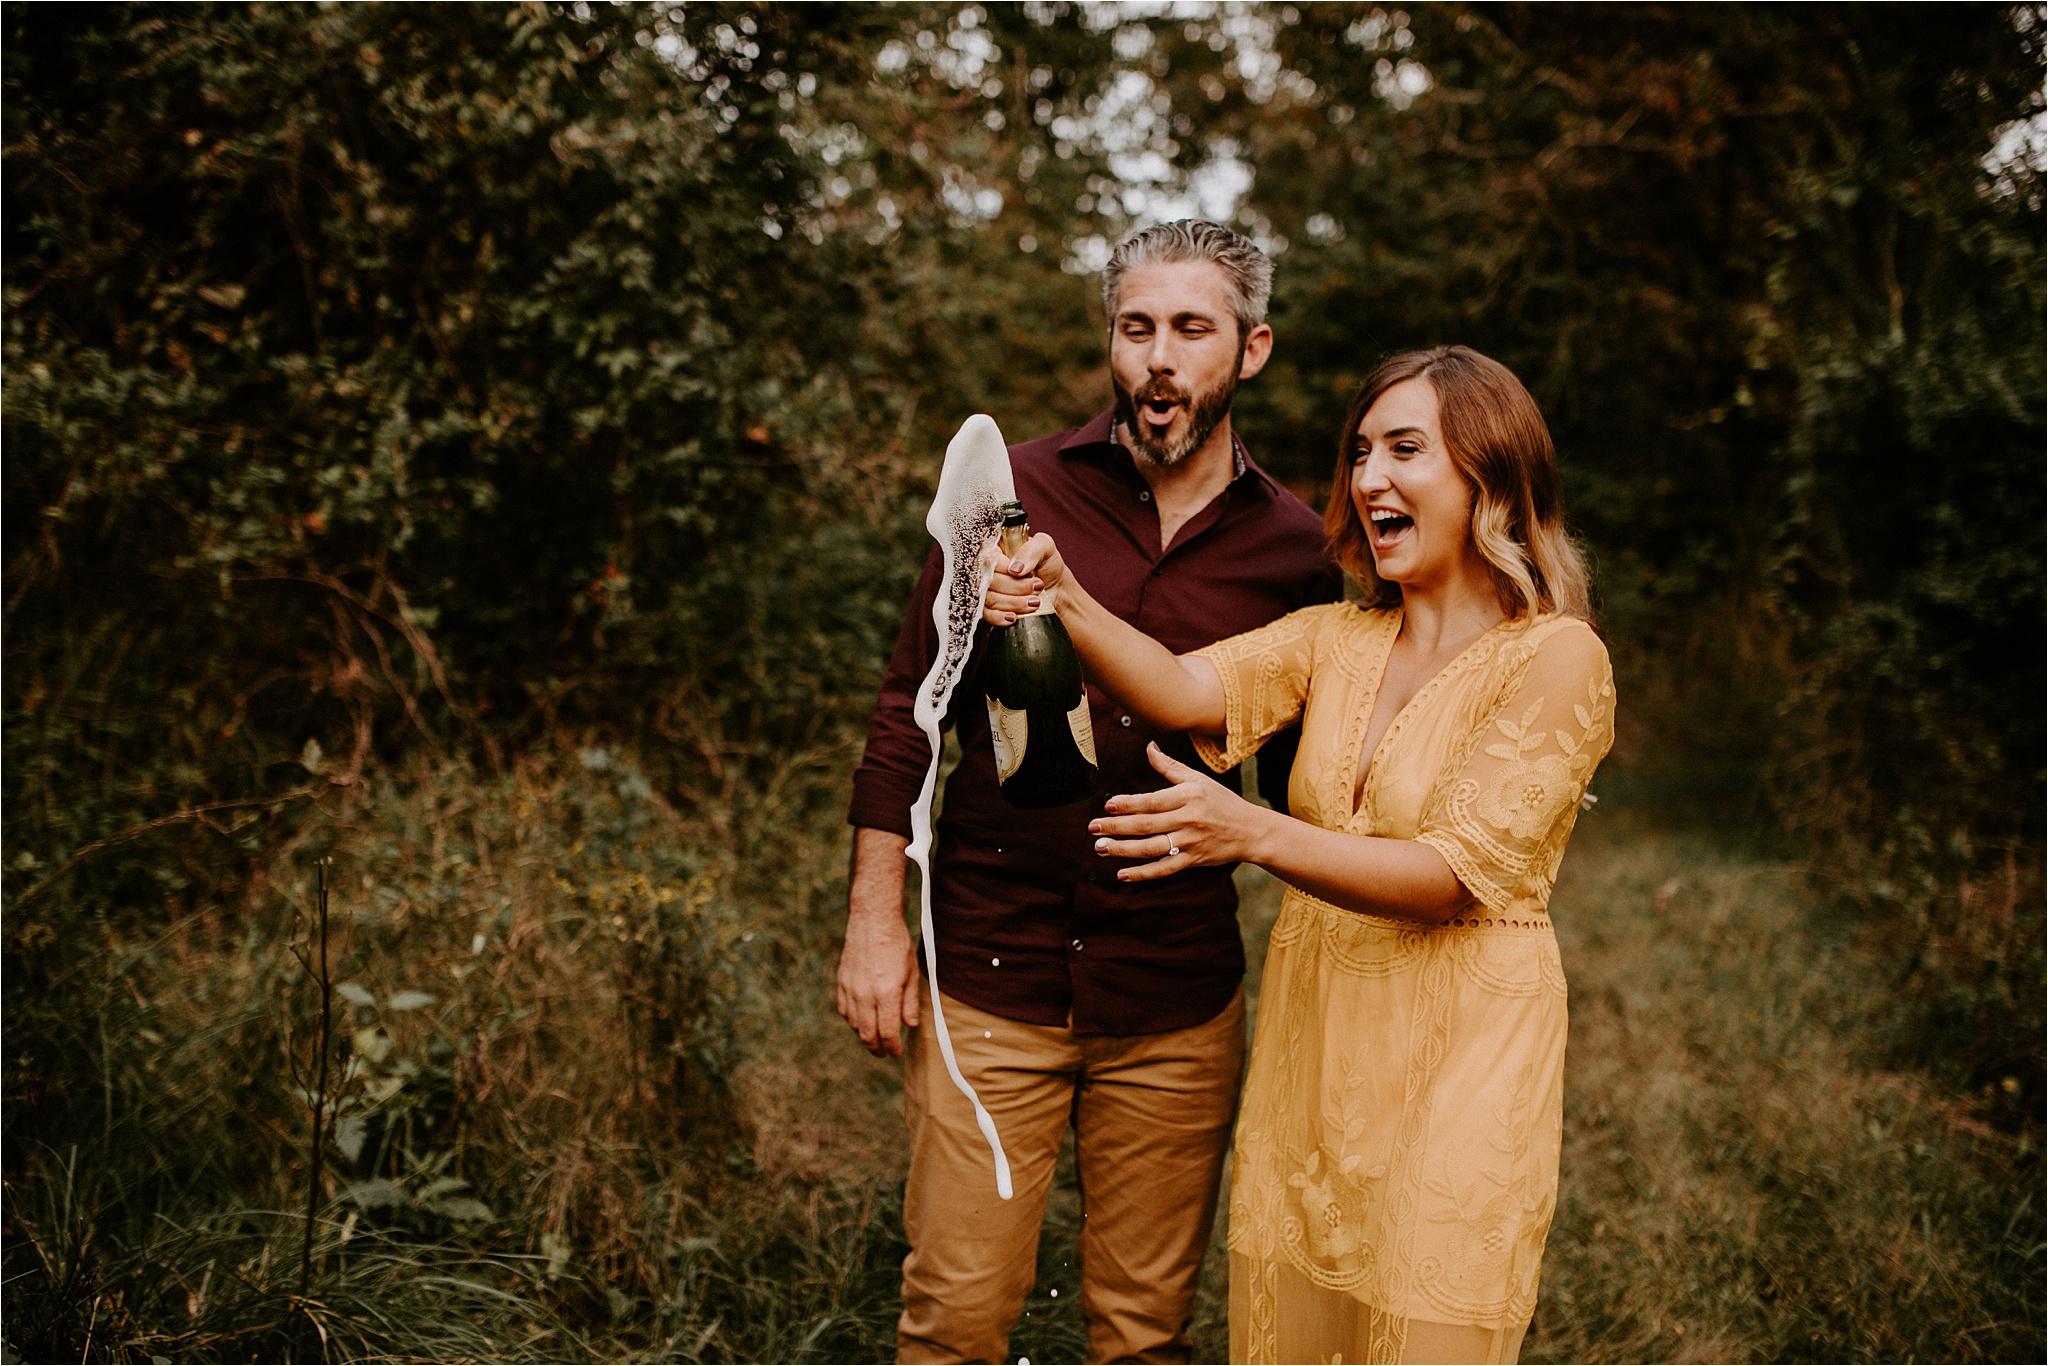 Heather_+_Richard_Engagement_0013.jpg